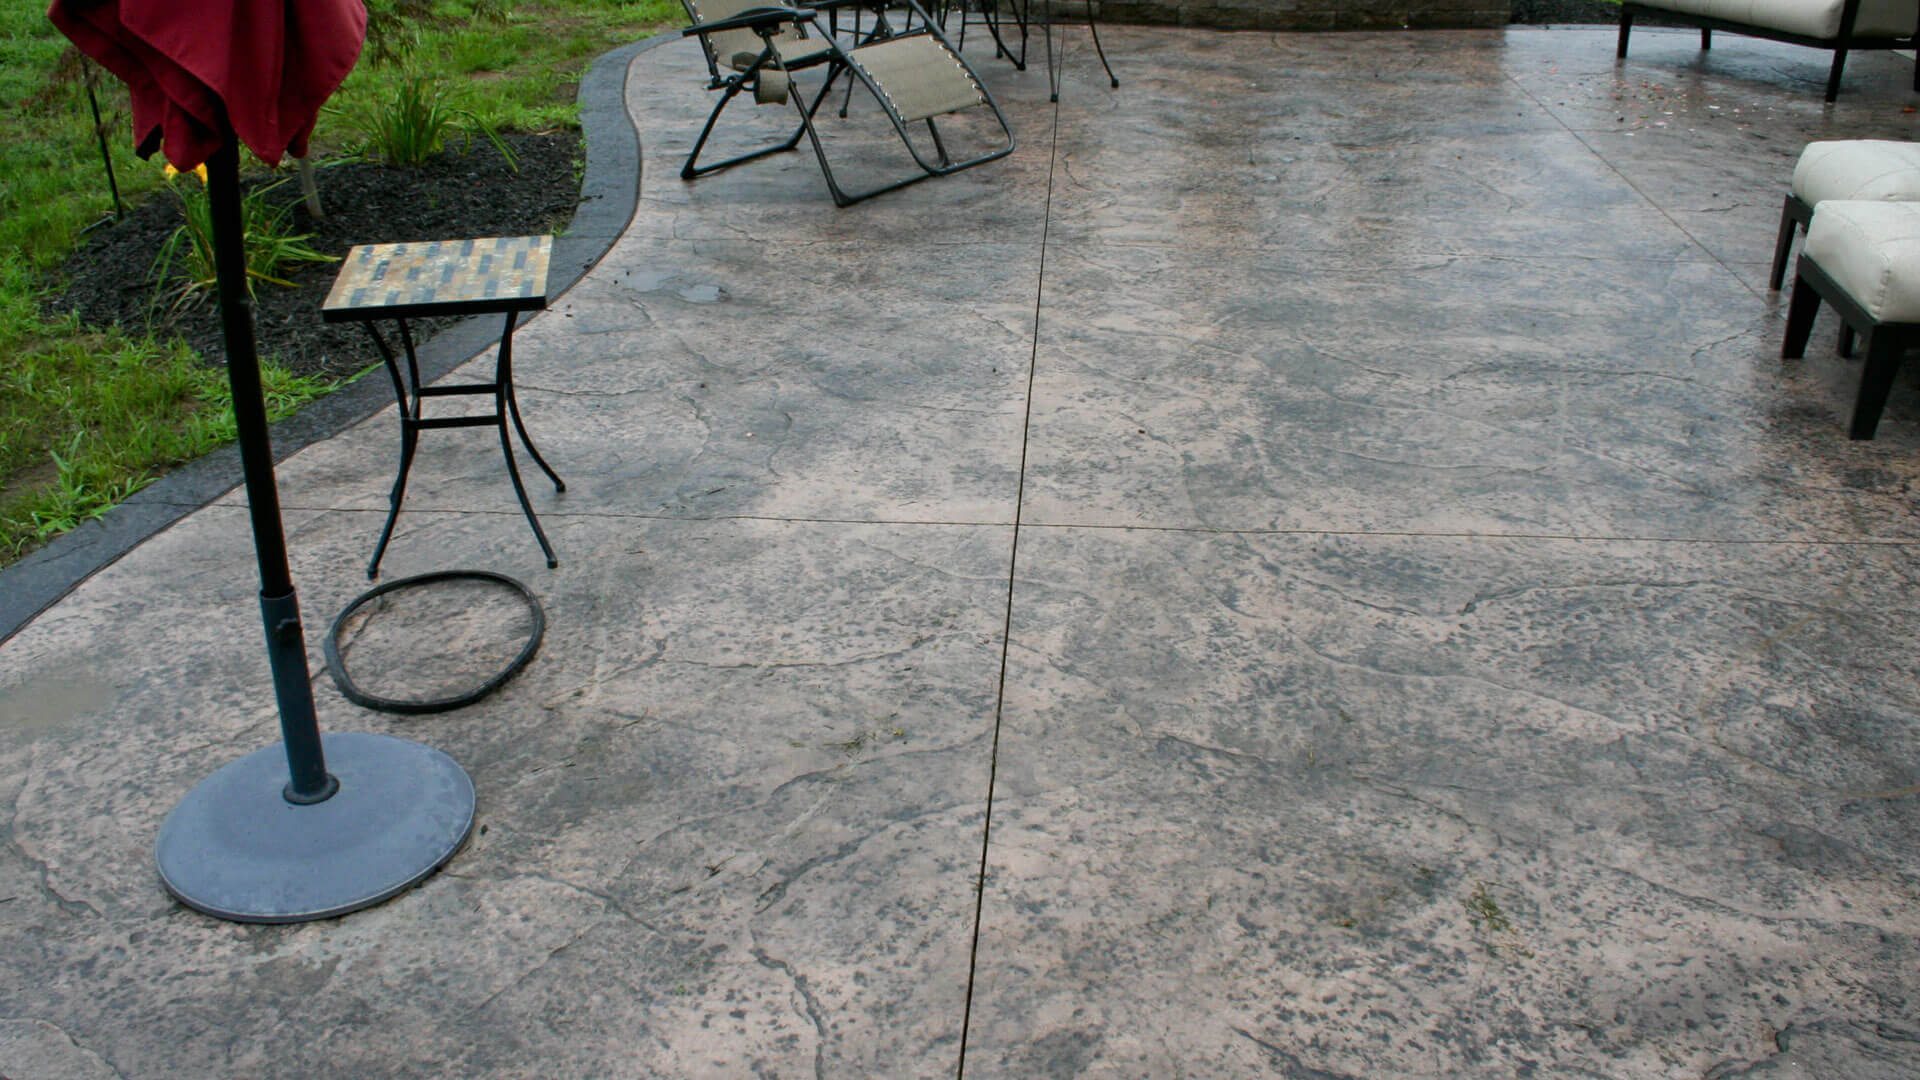 San Jose Landscaping Company, Concrete Contractor and Landscaper